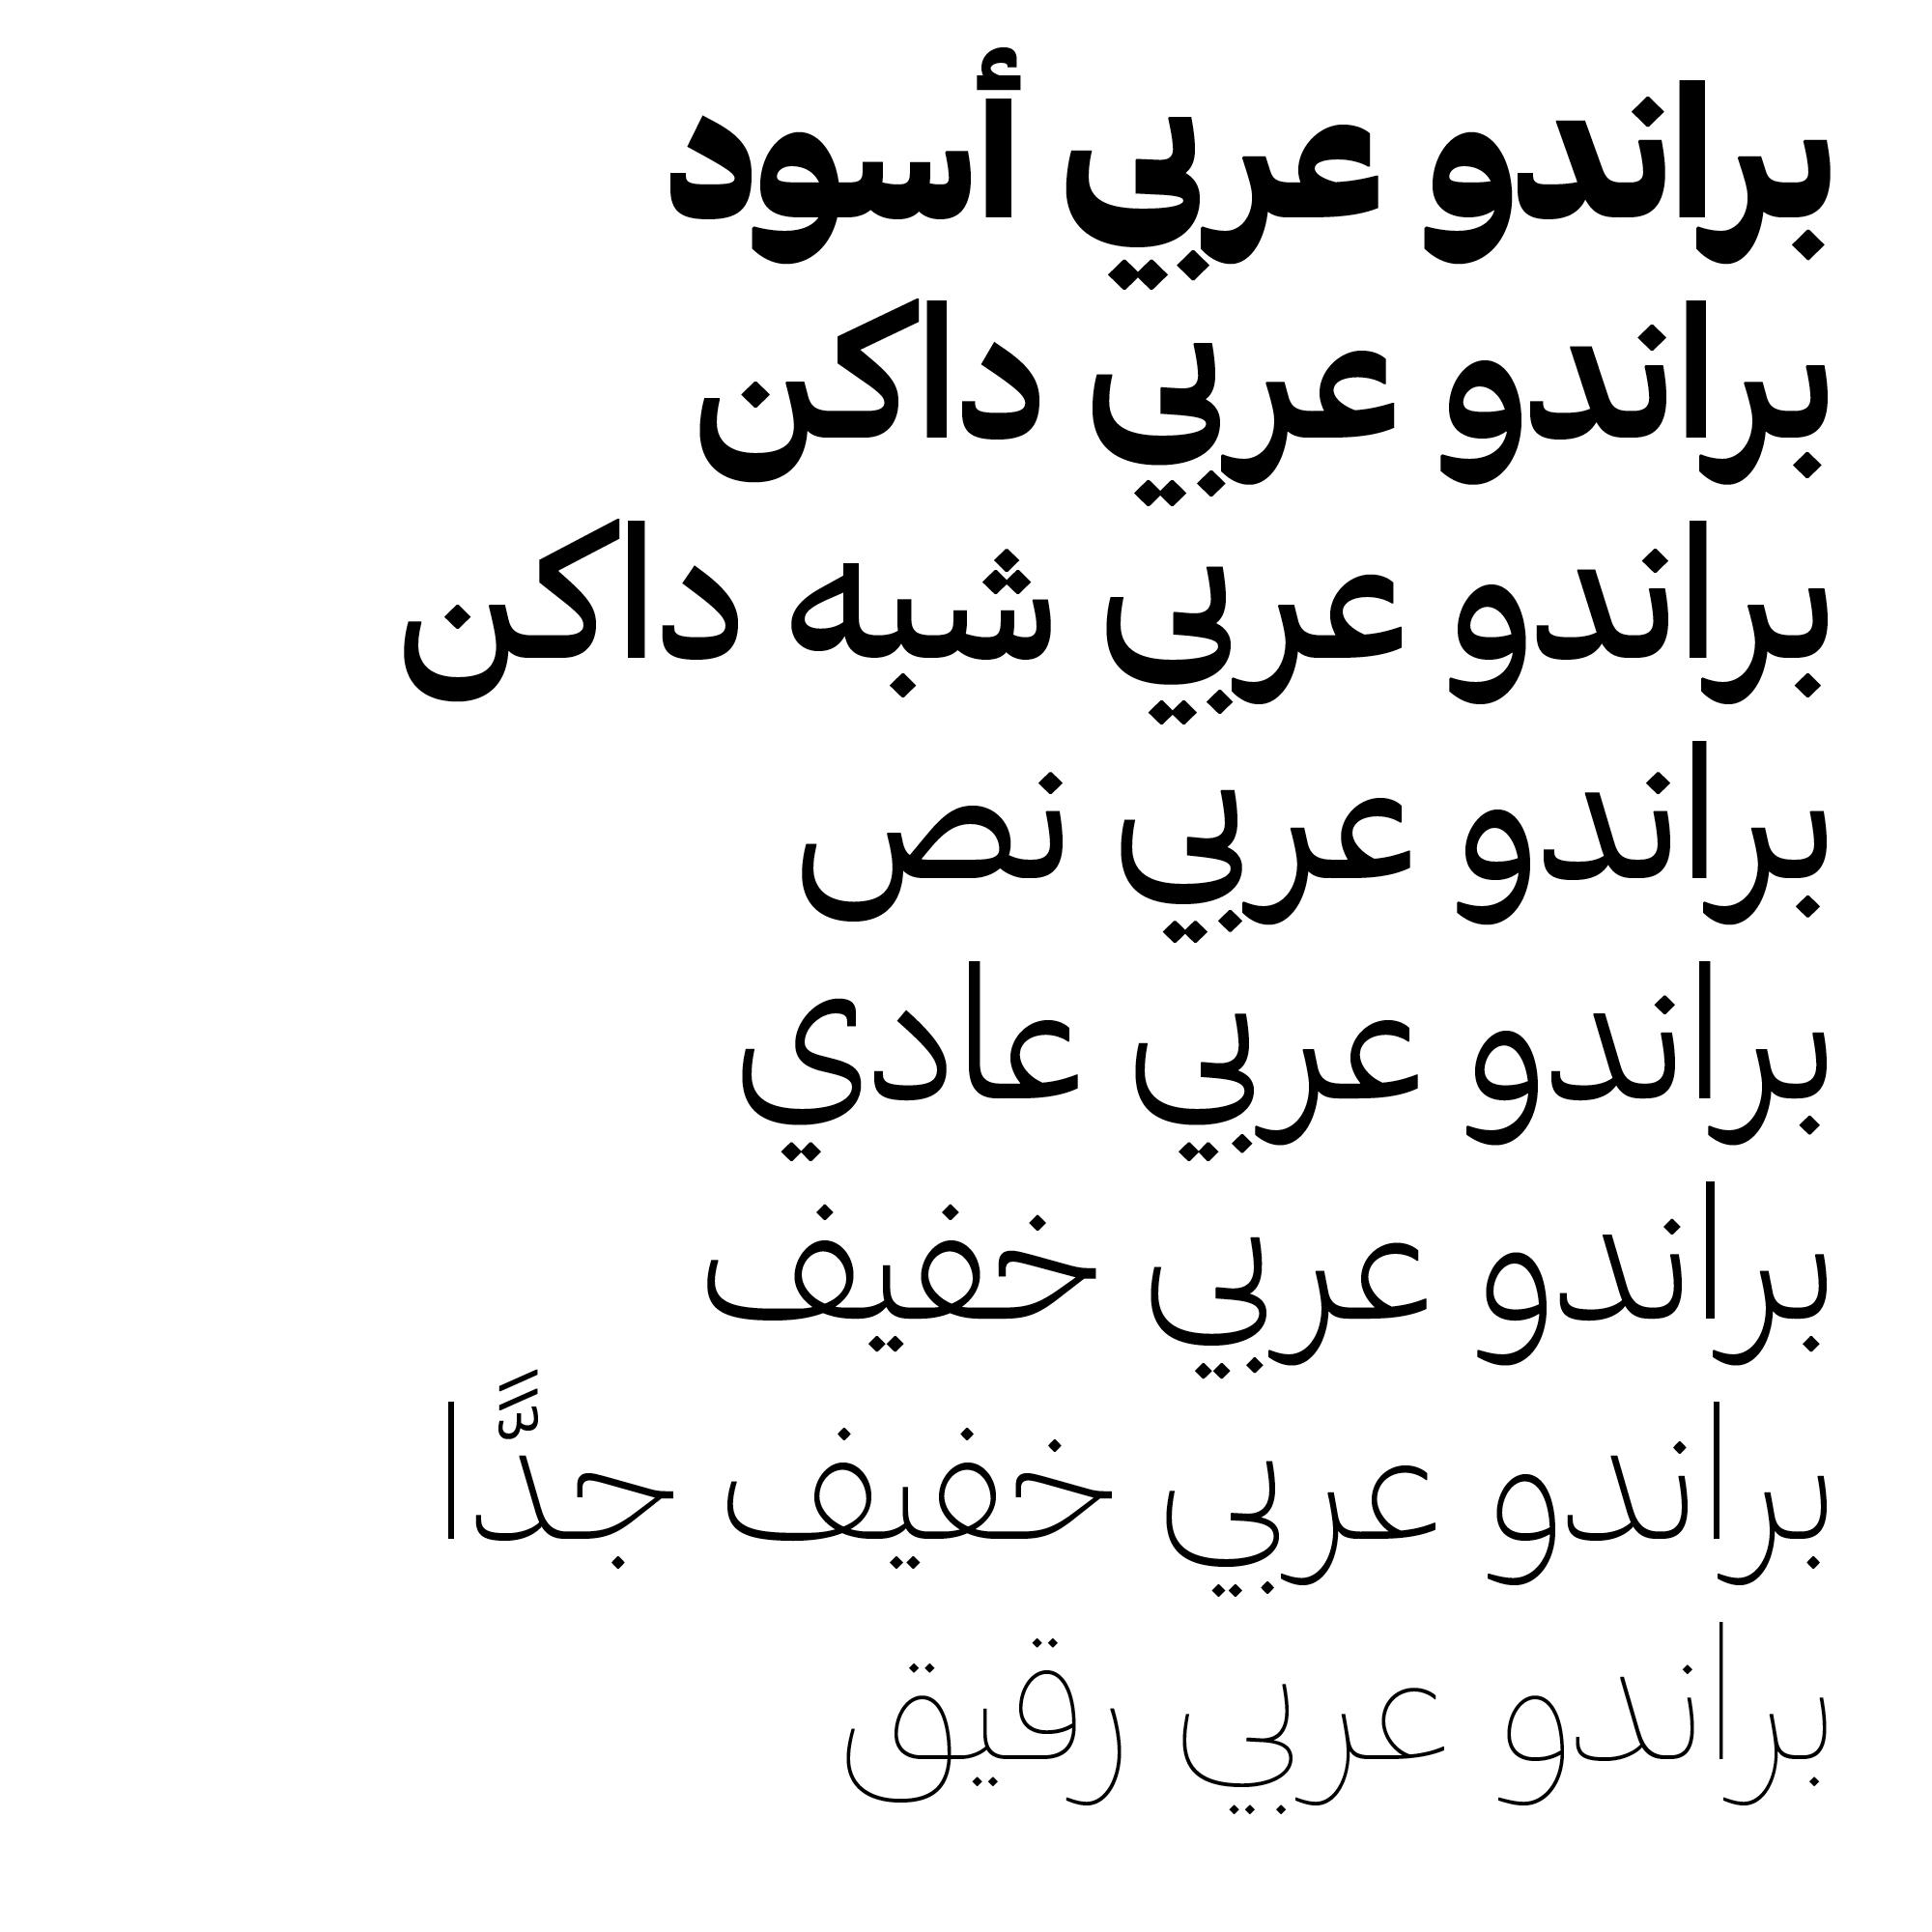 Brando Arabic fonts